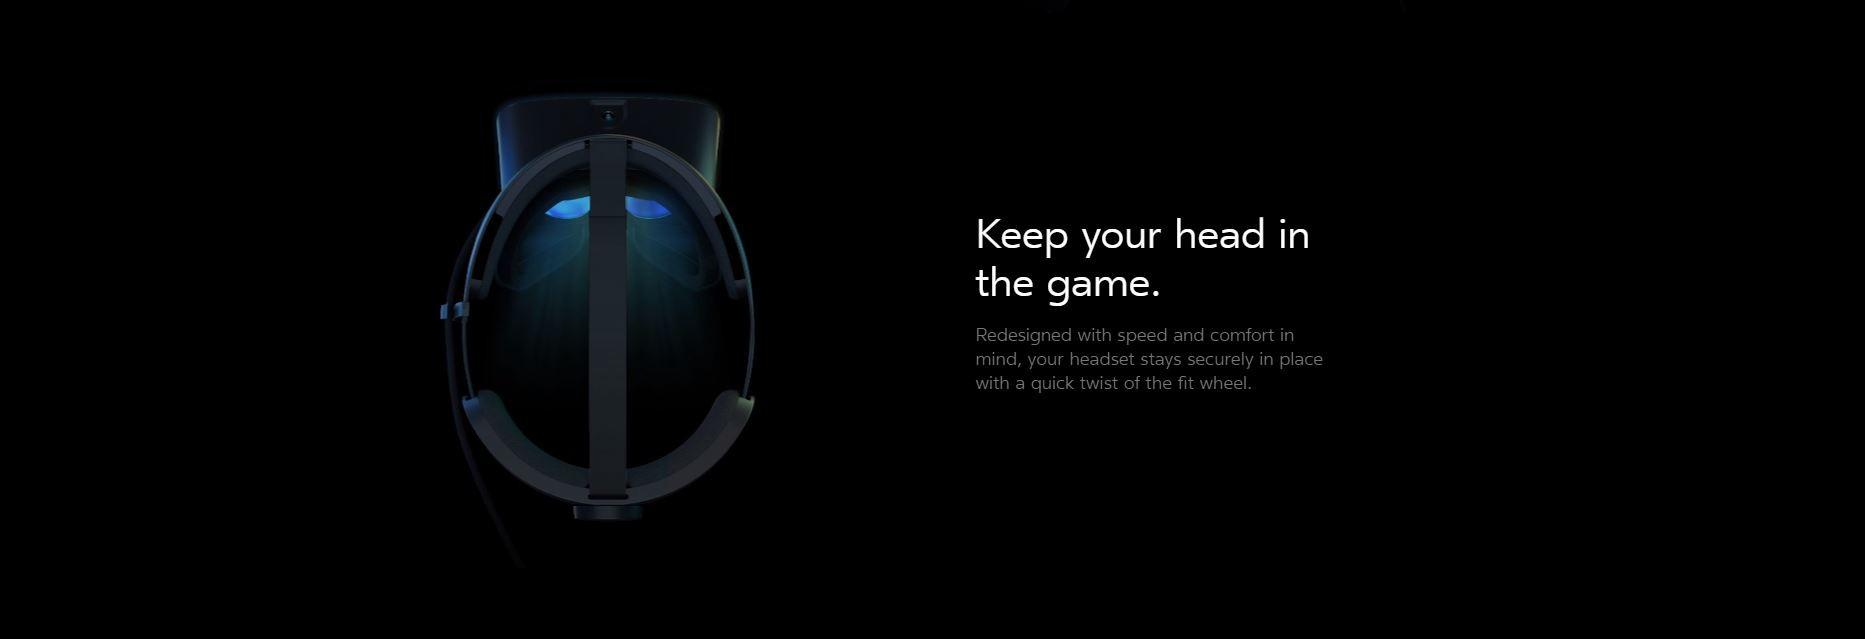 Oculus Rift S Virtual Reality Headset Unveiled - Virtual Reality